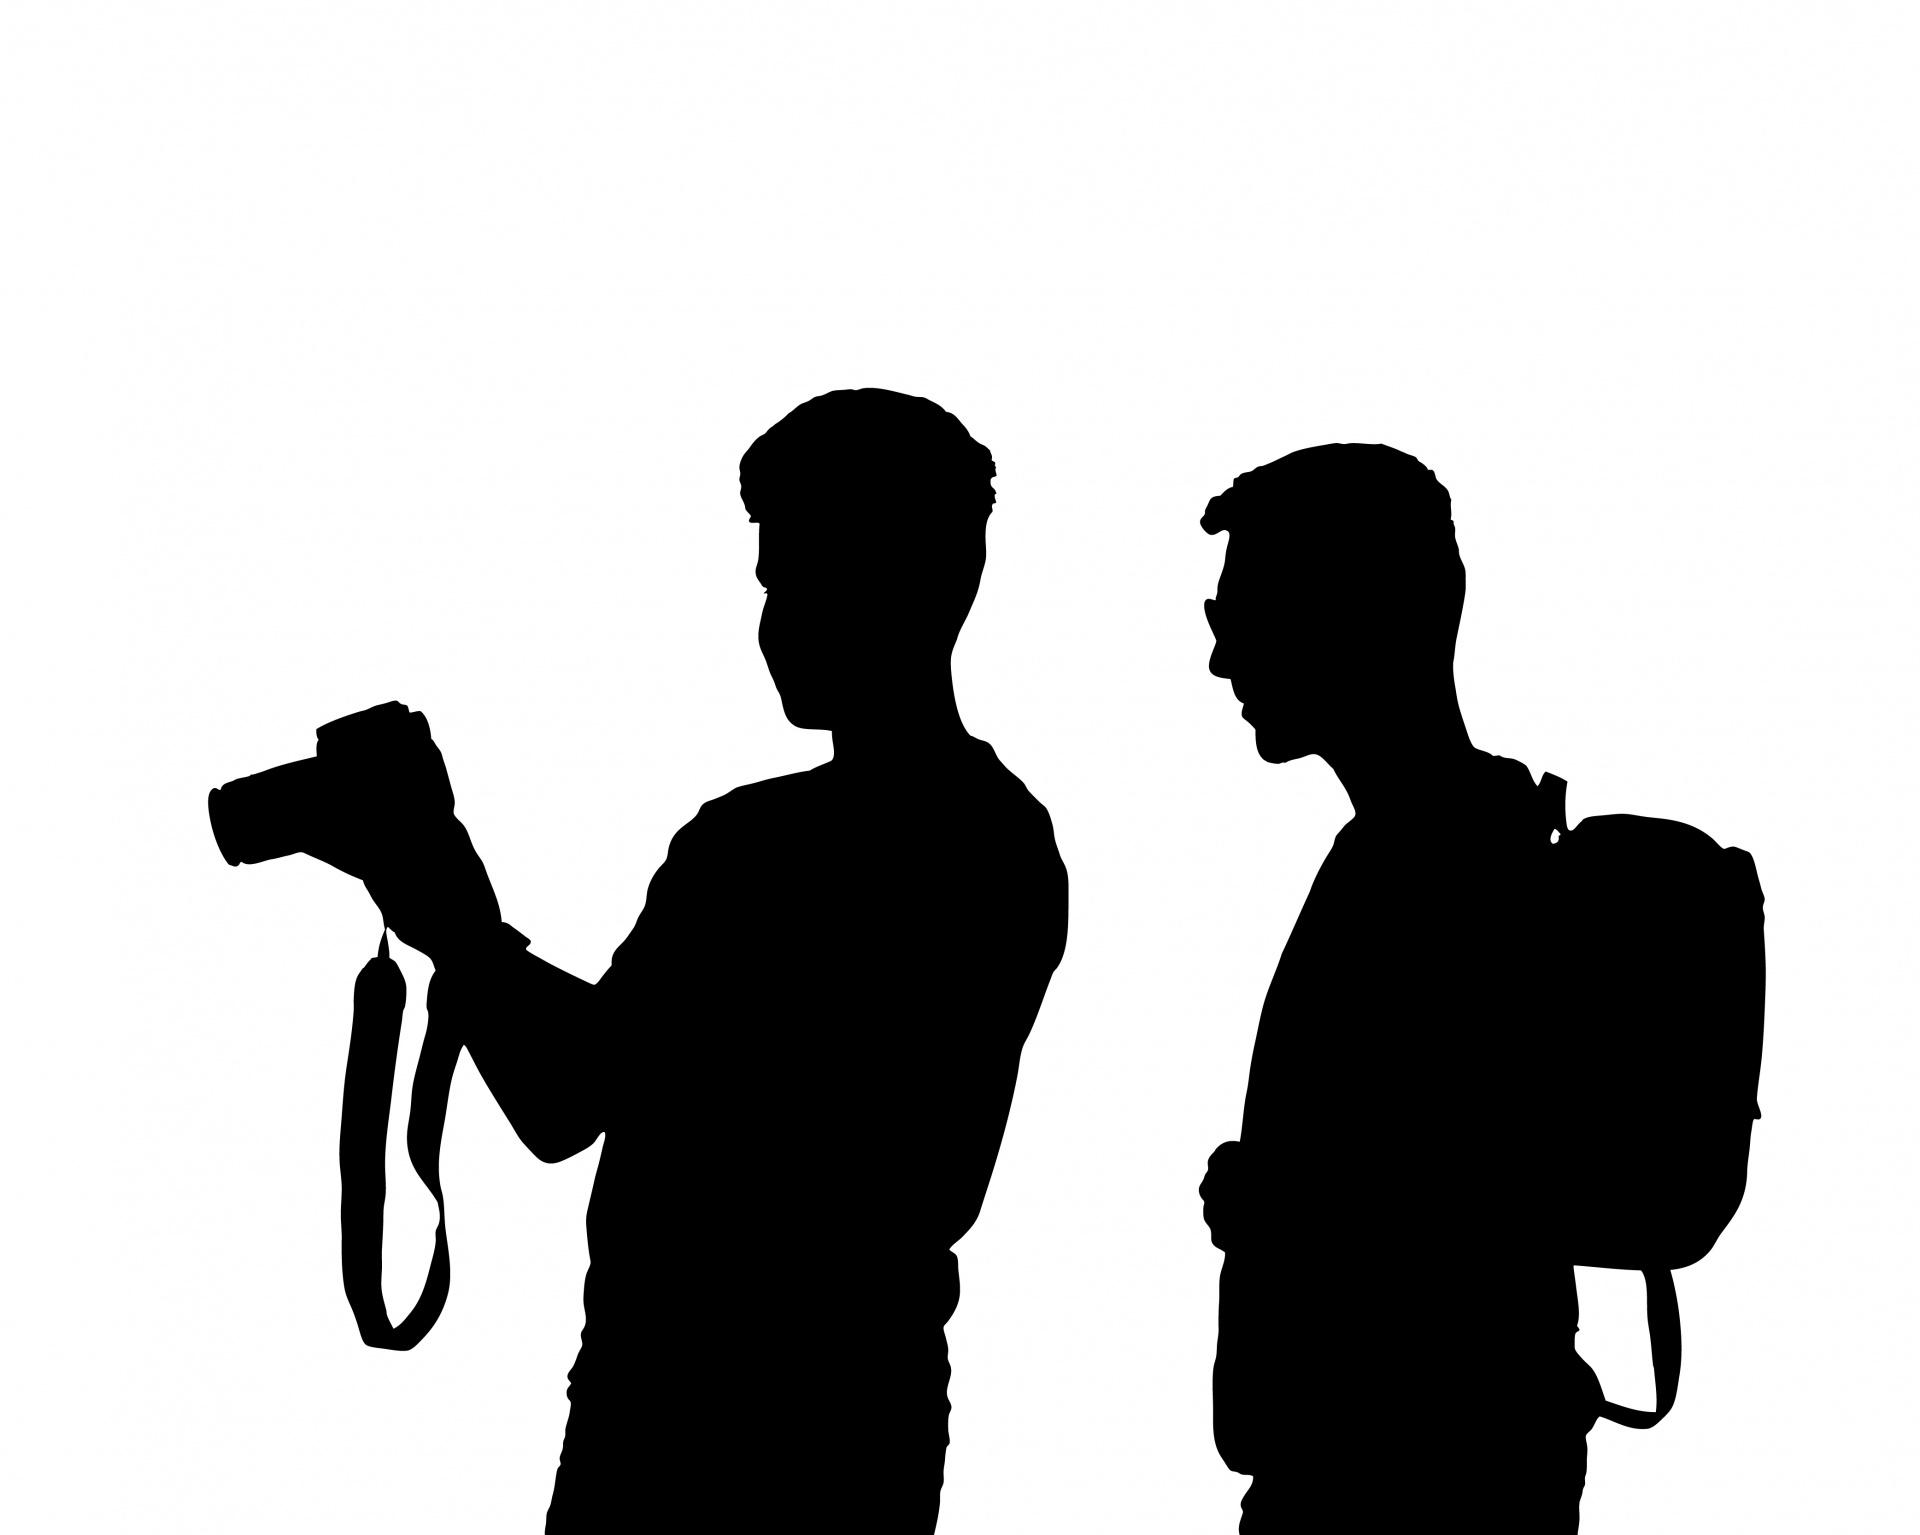 1920x1535 Photographer Silhouette Free Stock Photo